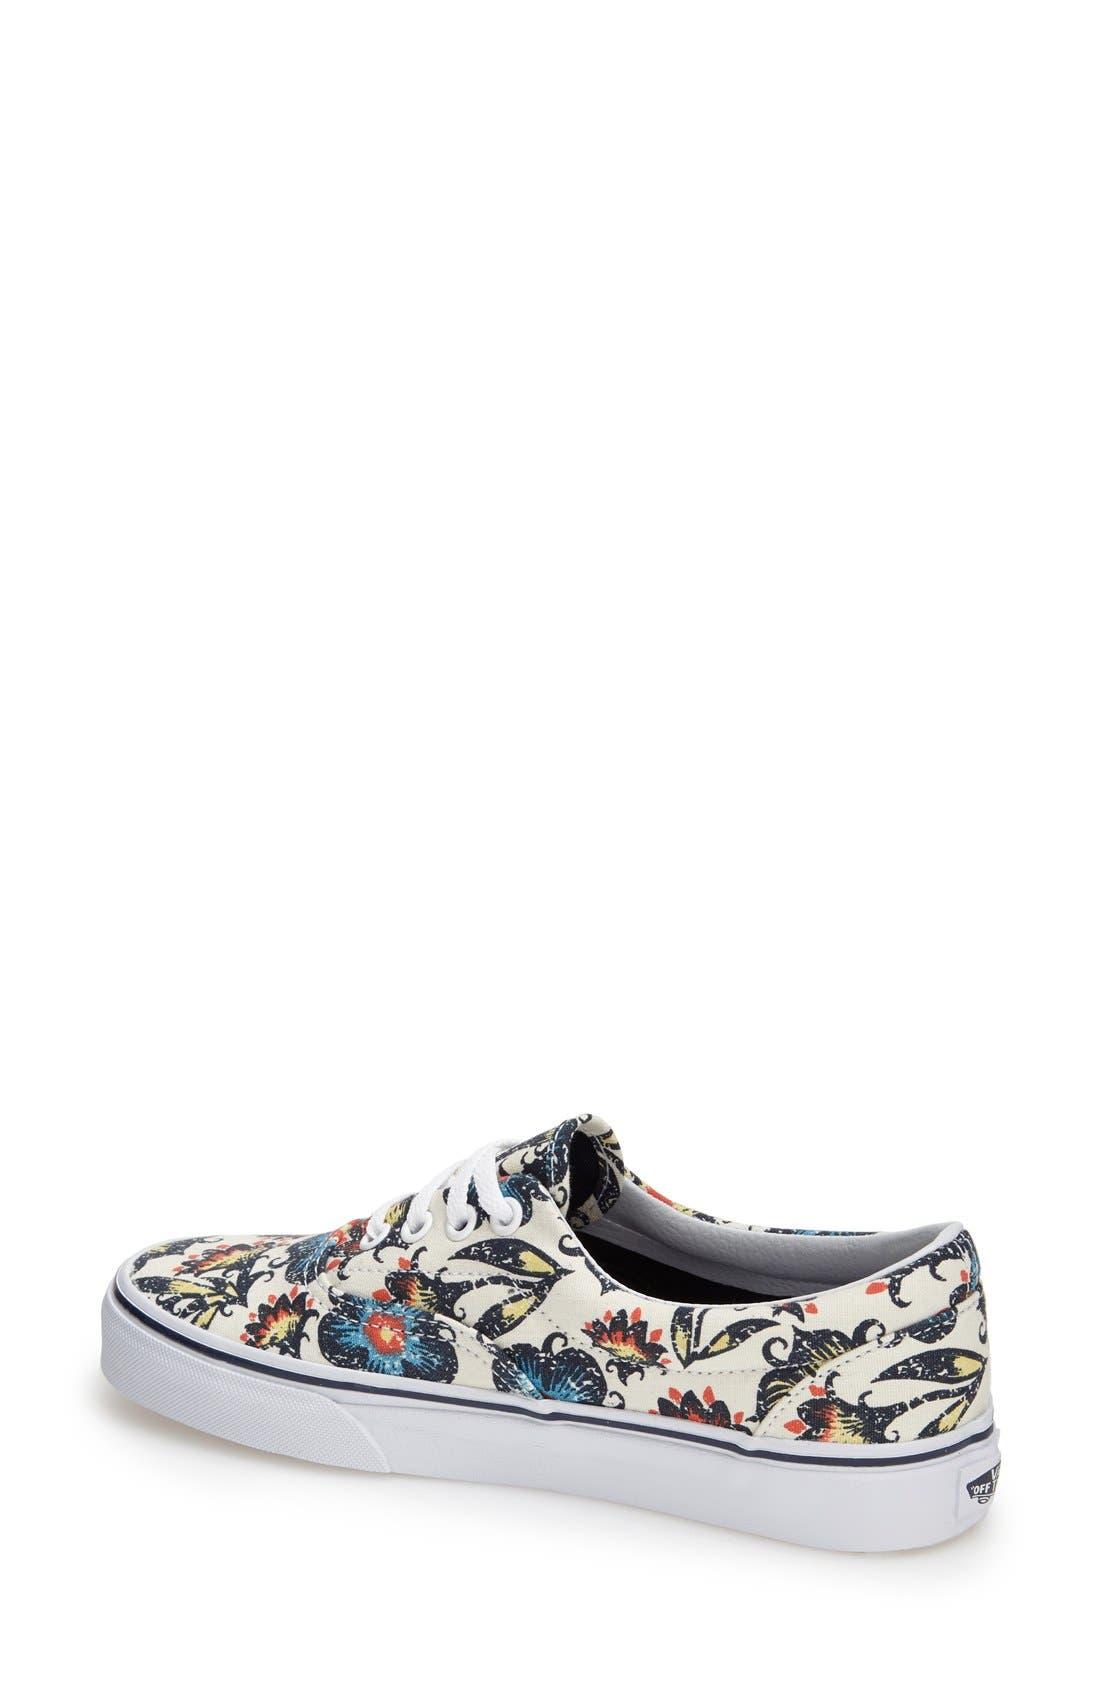 Alternate Image 2  - Vans 'Era' Floral Print Sneaker (Women)